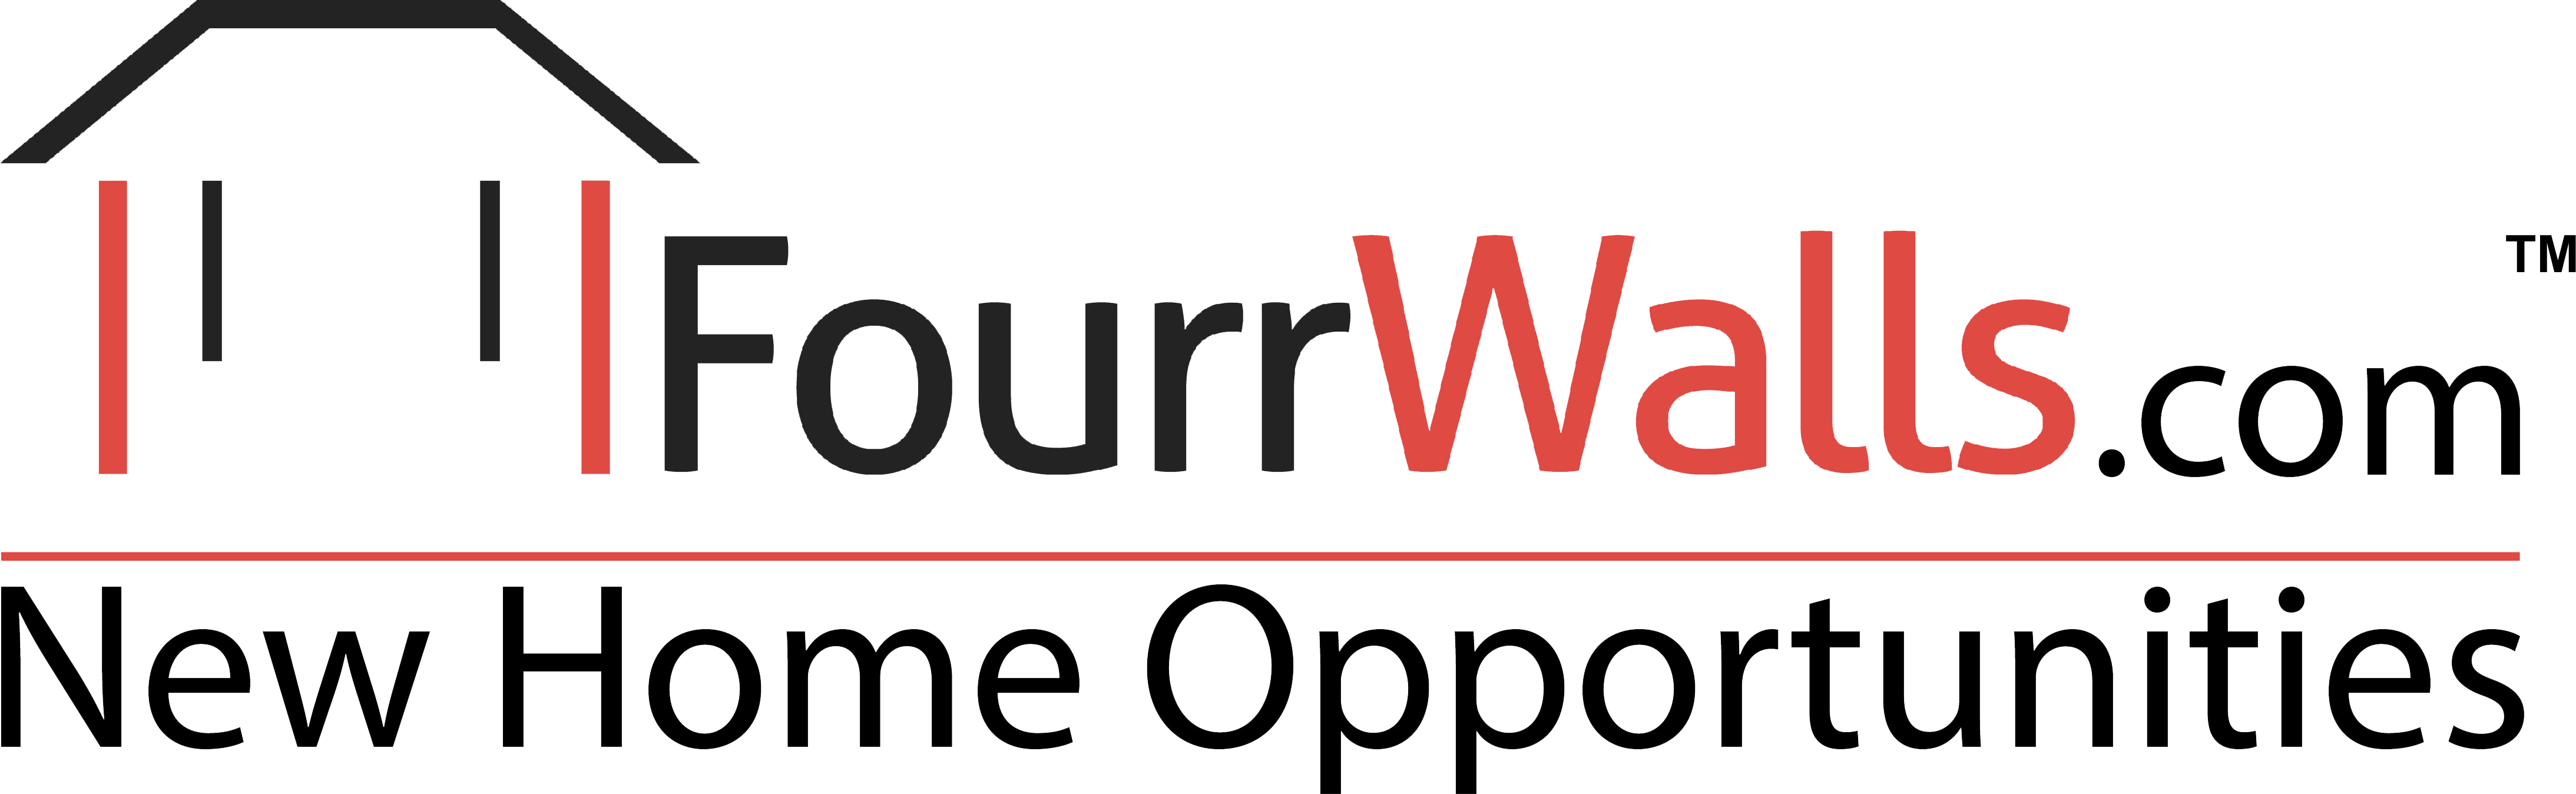 FourrWalls - Jobs For Women